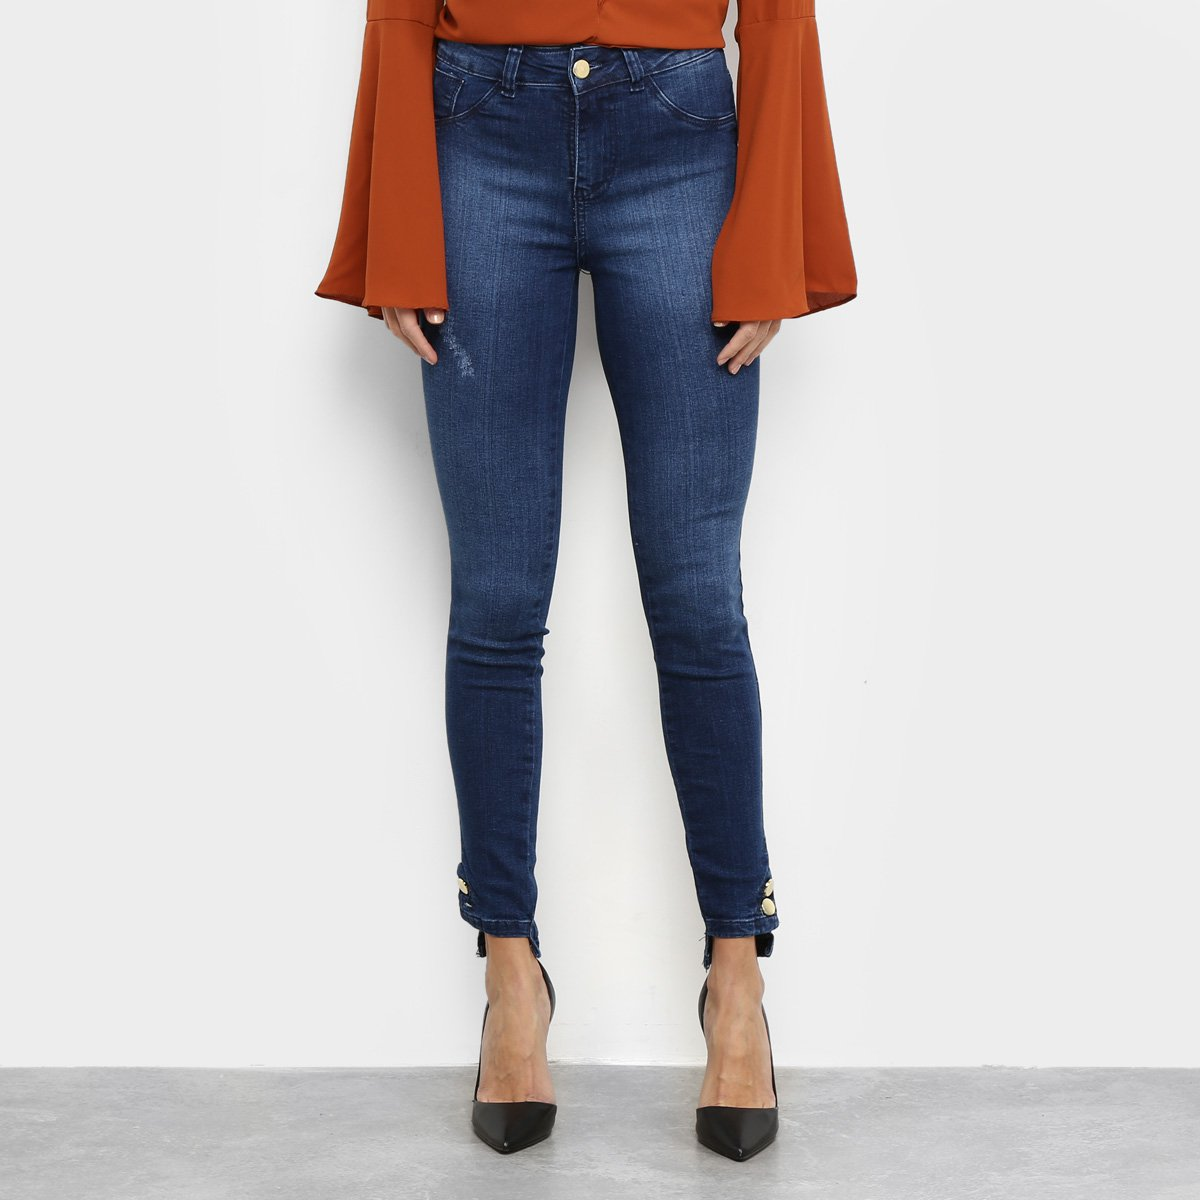 Calça Jeans Skinny Estonada Botões Barra Feminina